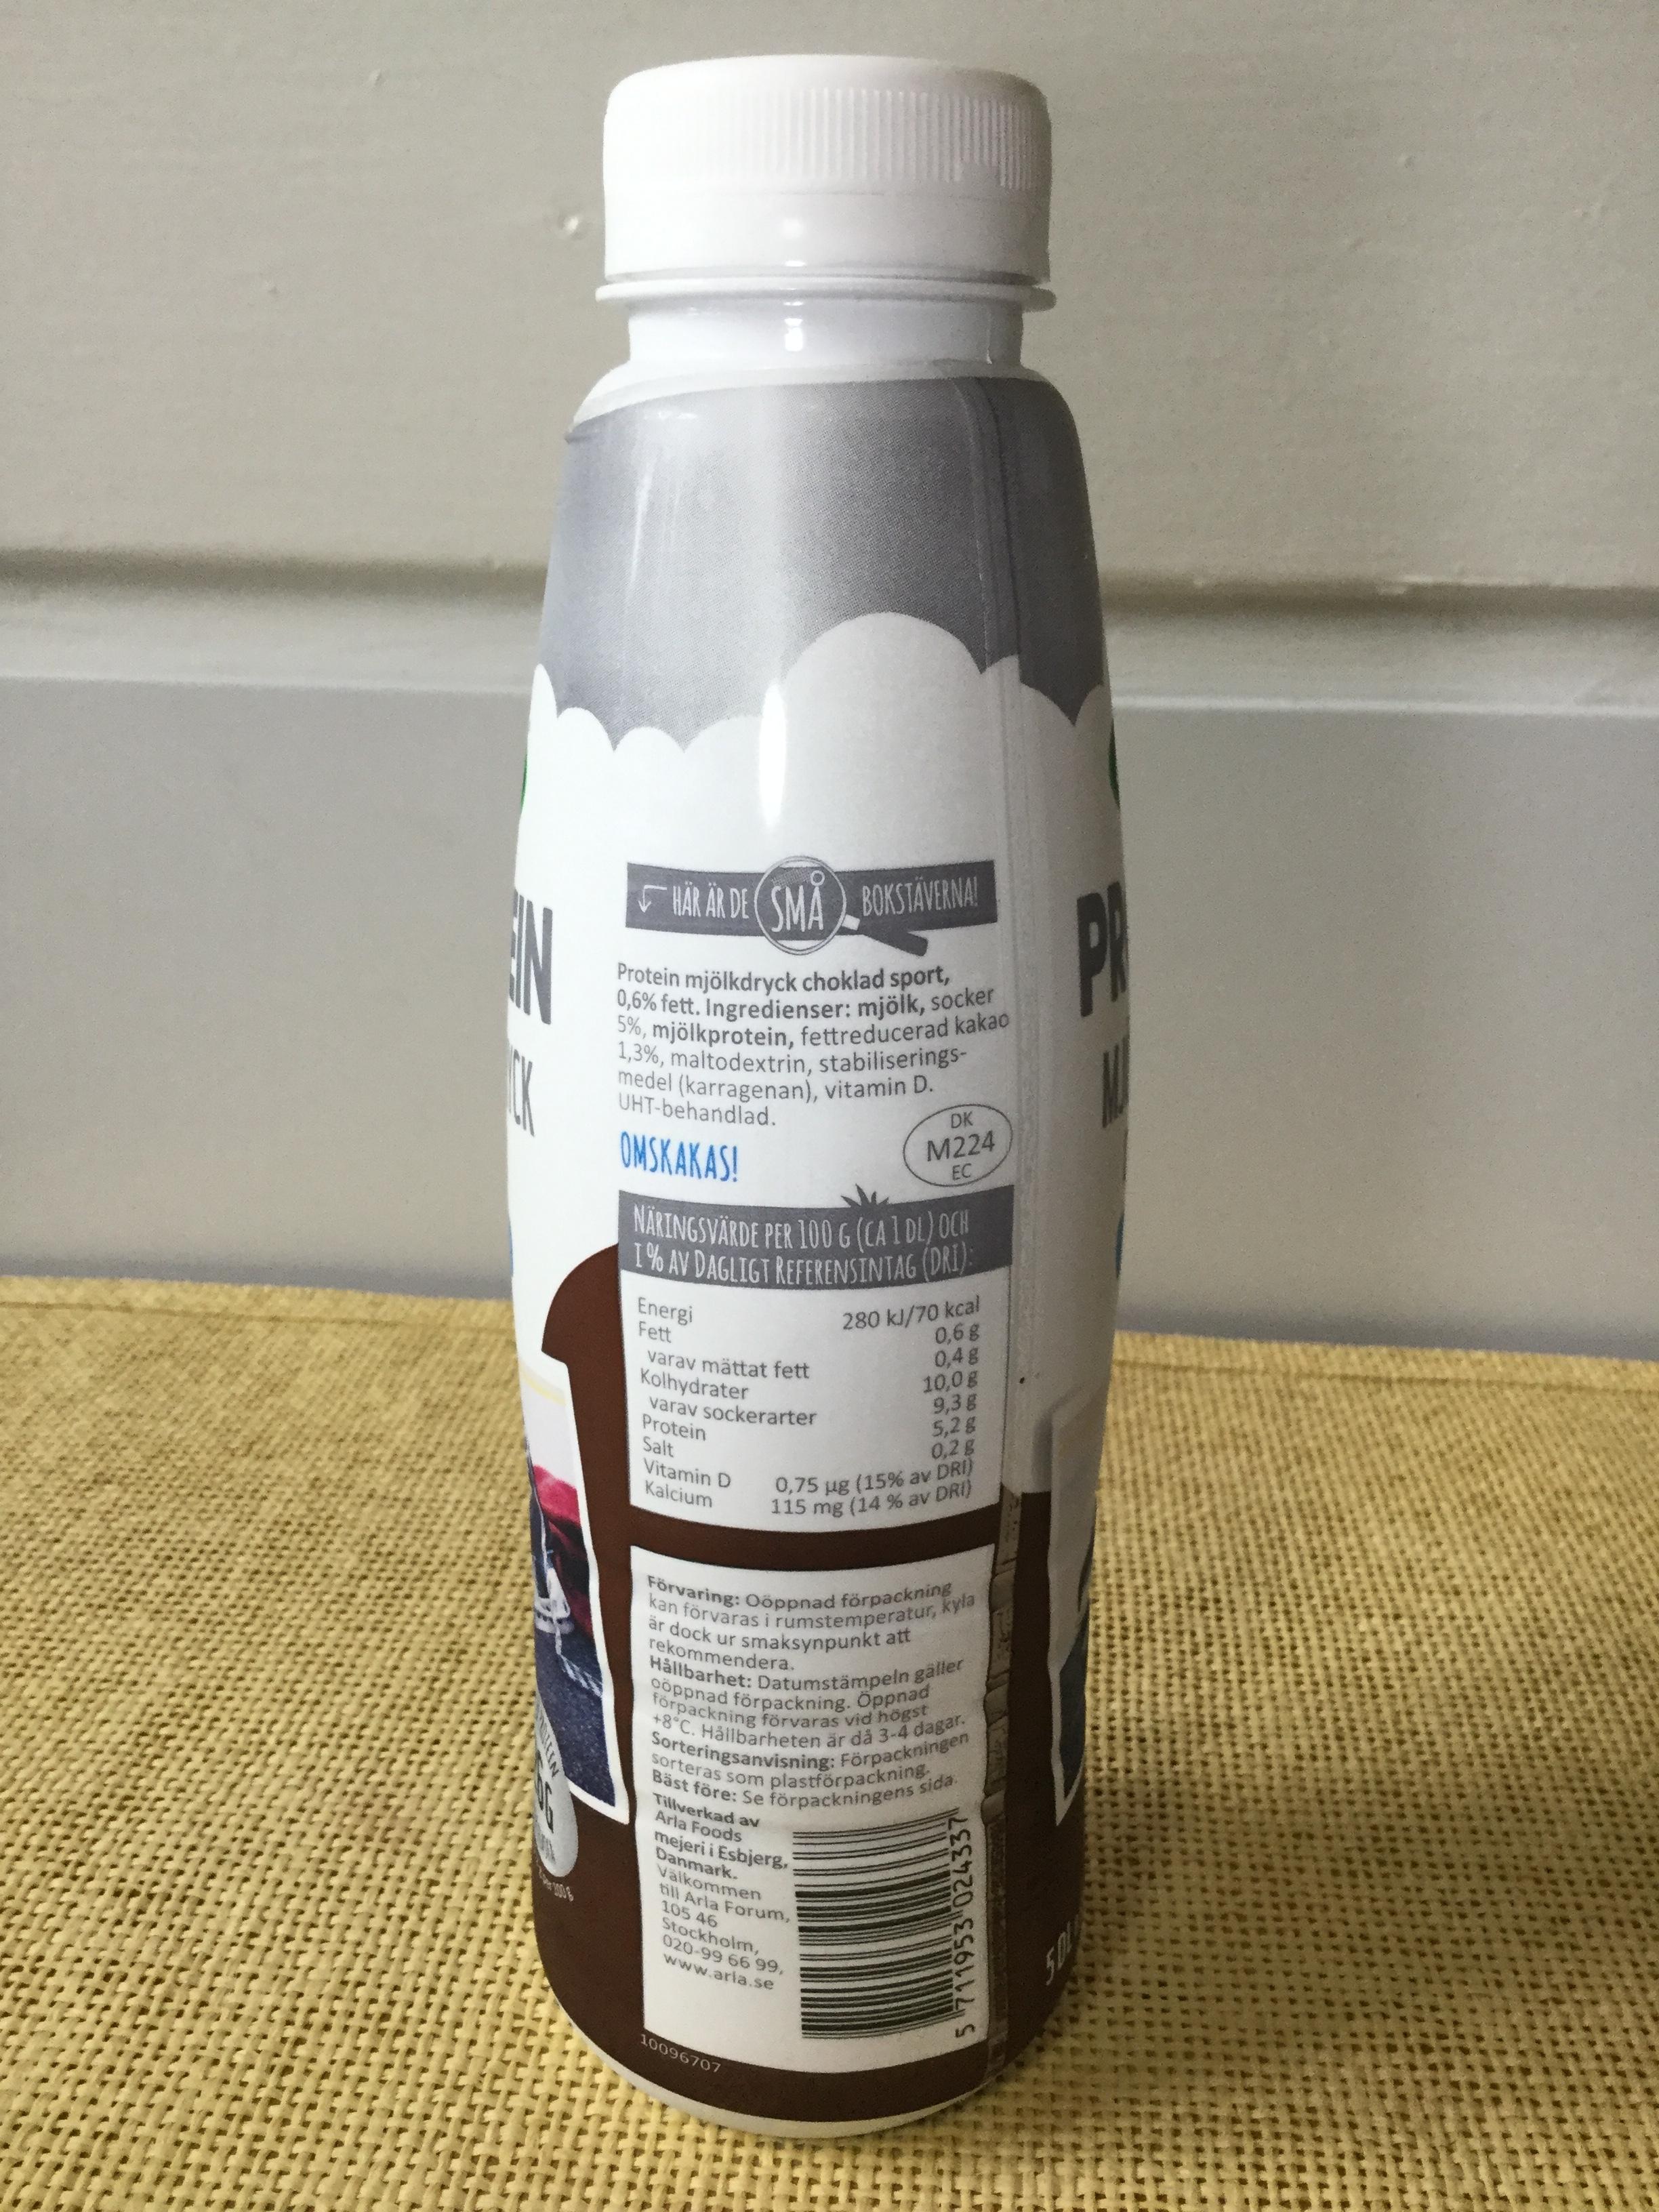 Arla Protein Choklad Mjölkdryck Sport Side 1